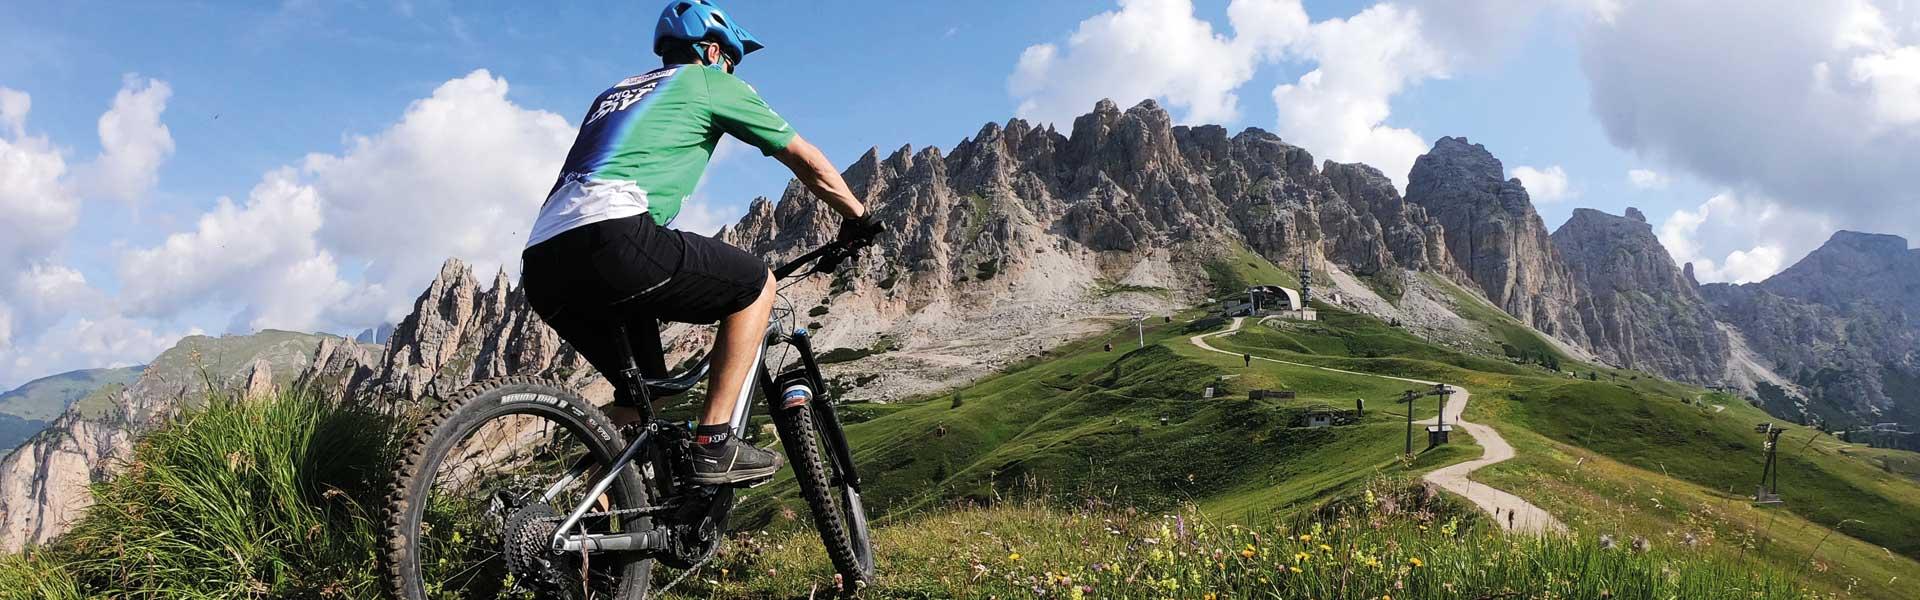 bike tour Val Gardena - passo gardena